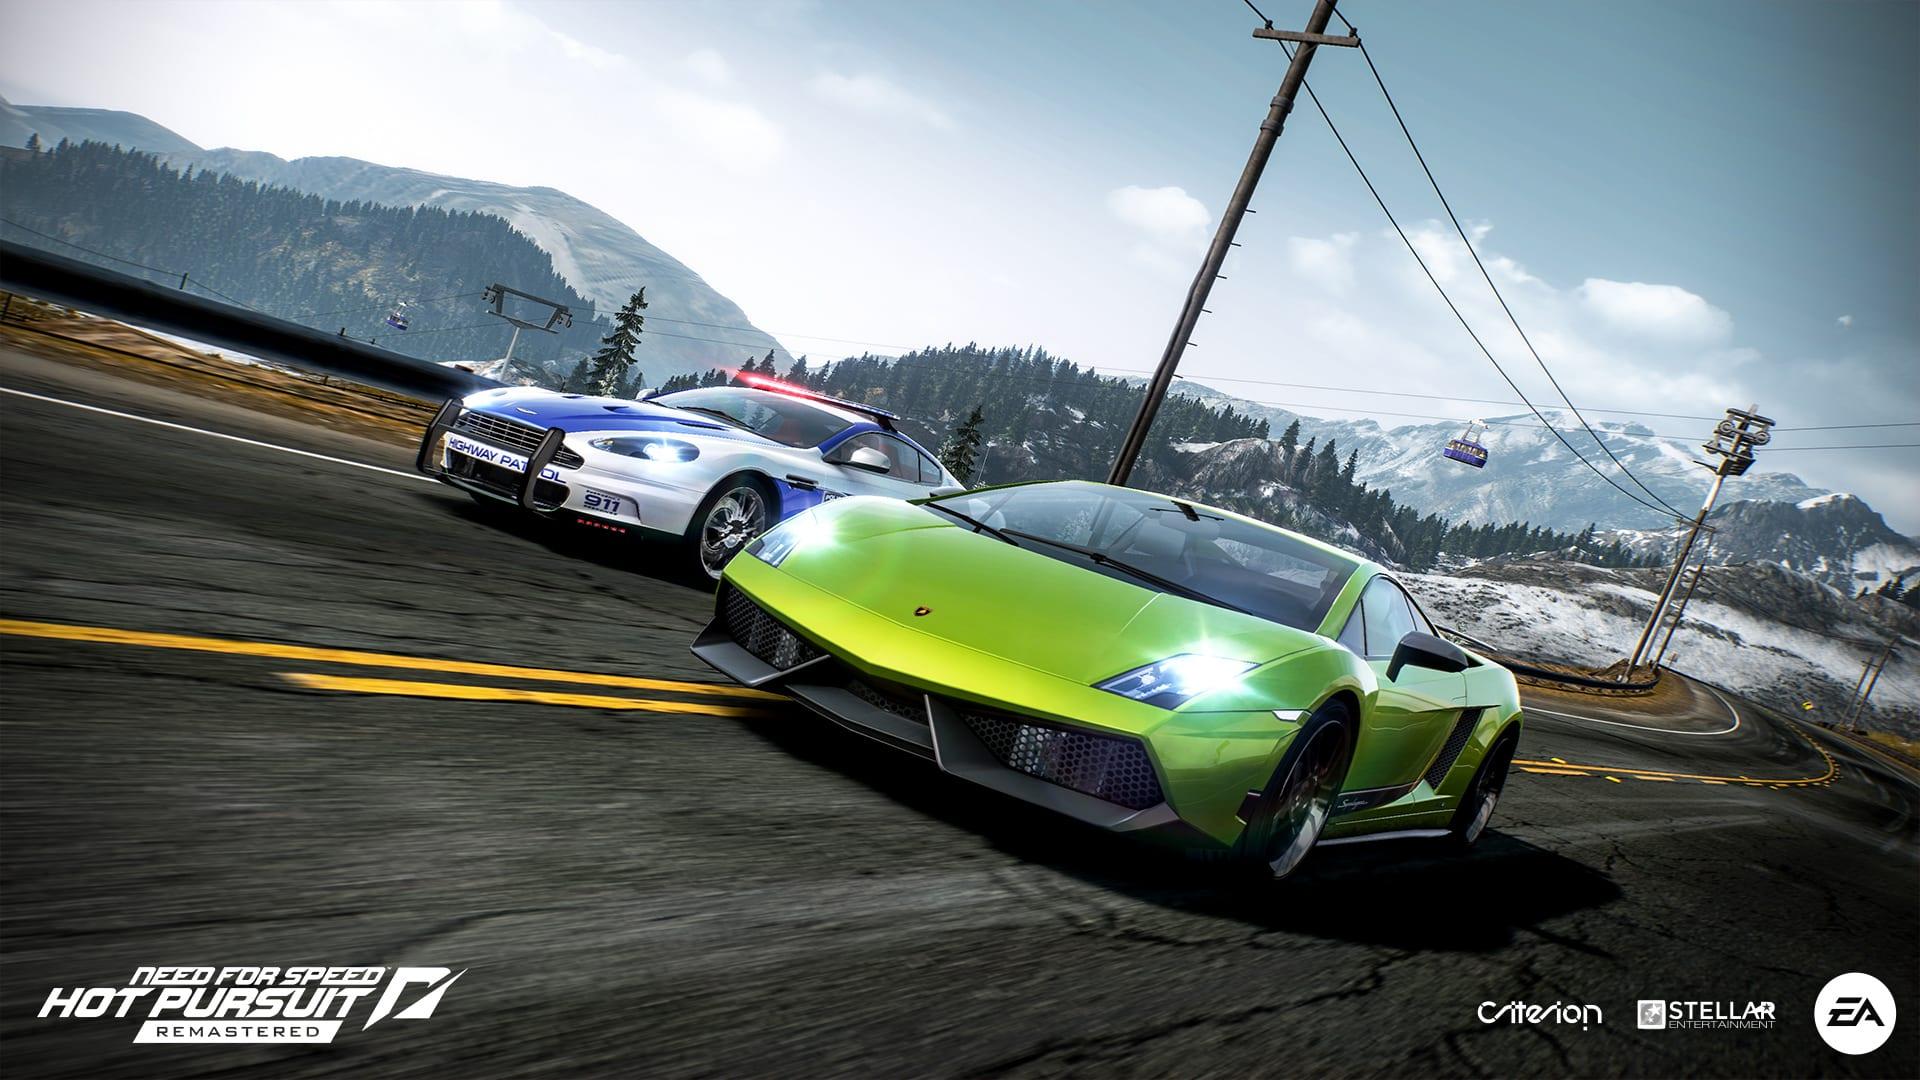 Need for Speed Hot Pursuit Remastered - Verfolgungsjagd